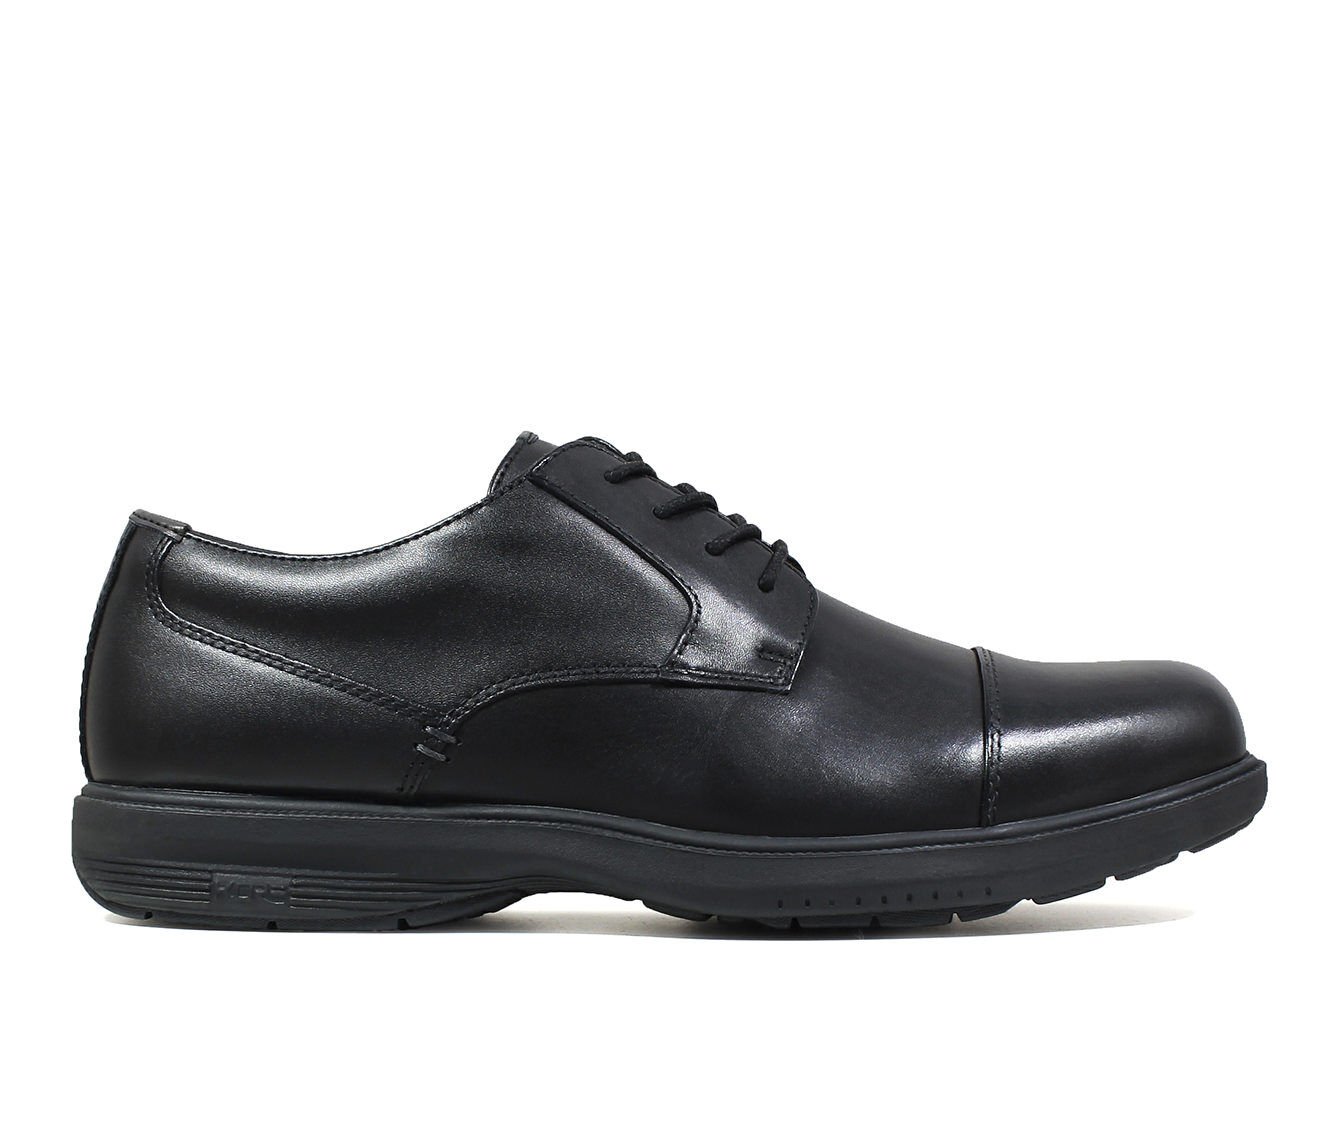 Men's Nunn Bush Melvin Street Cap Toe Oxfords Black